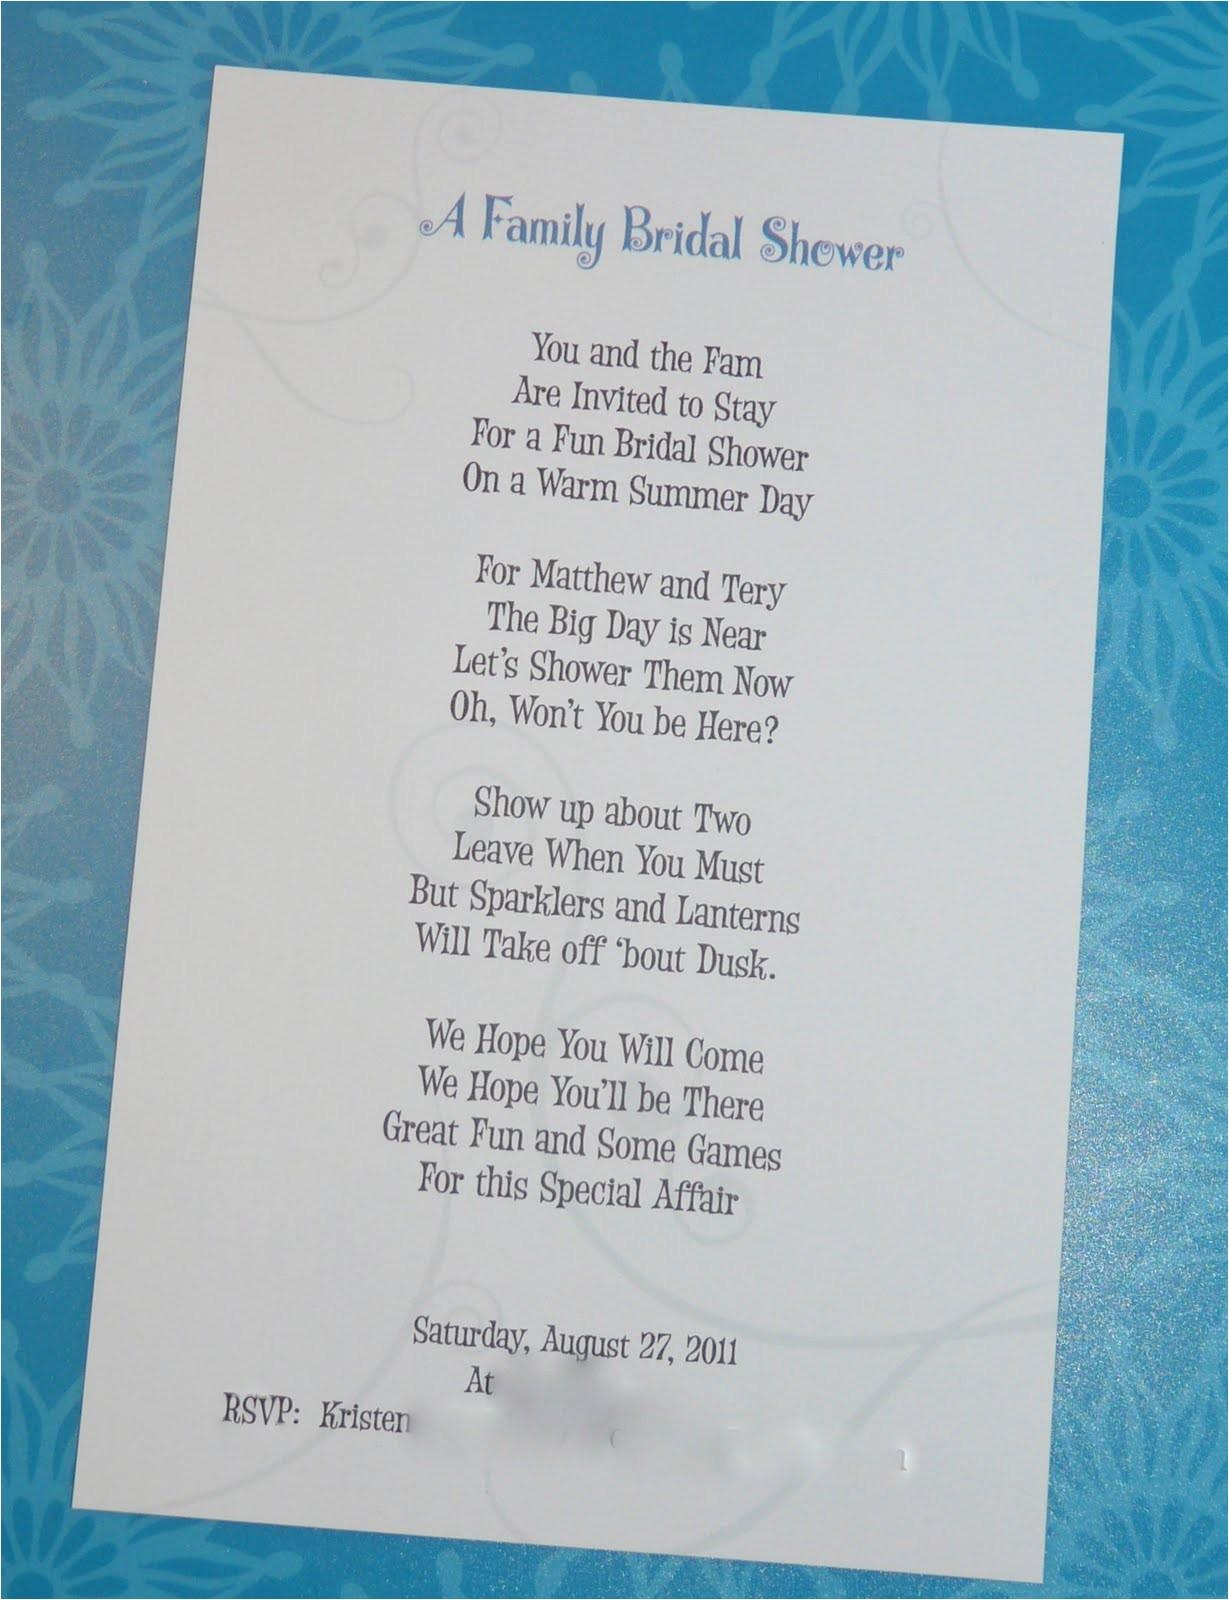 Poems Bridal Shower Invitations Writing A Bridal Shower Invitation Poem